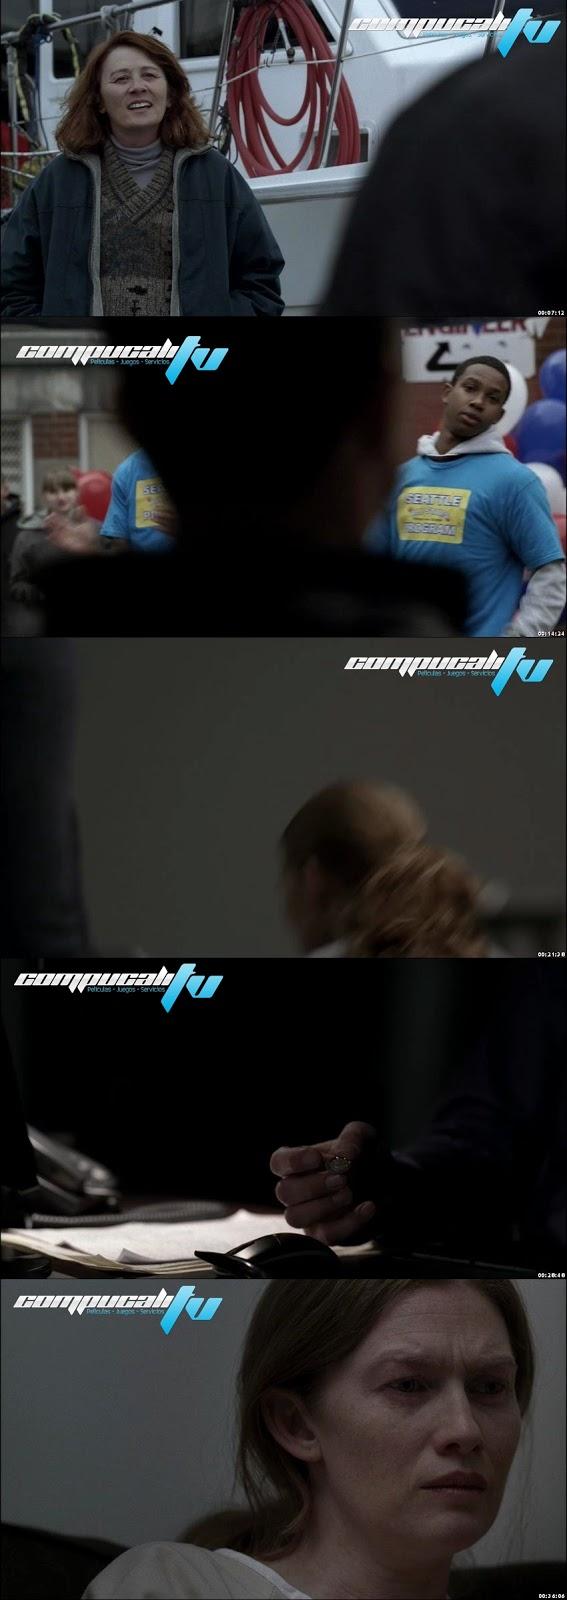 The Killing Temporada 2 Audio Español Latino HD 480o [13/13]